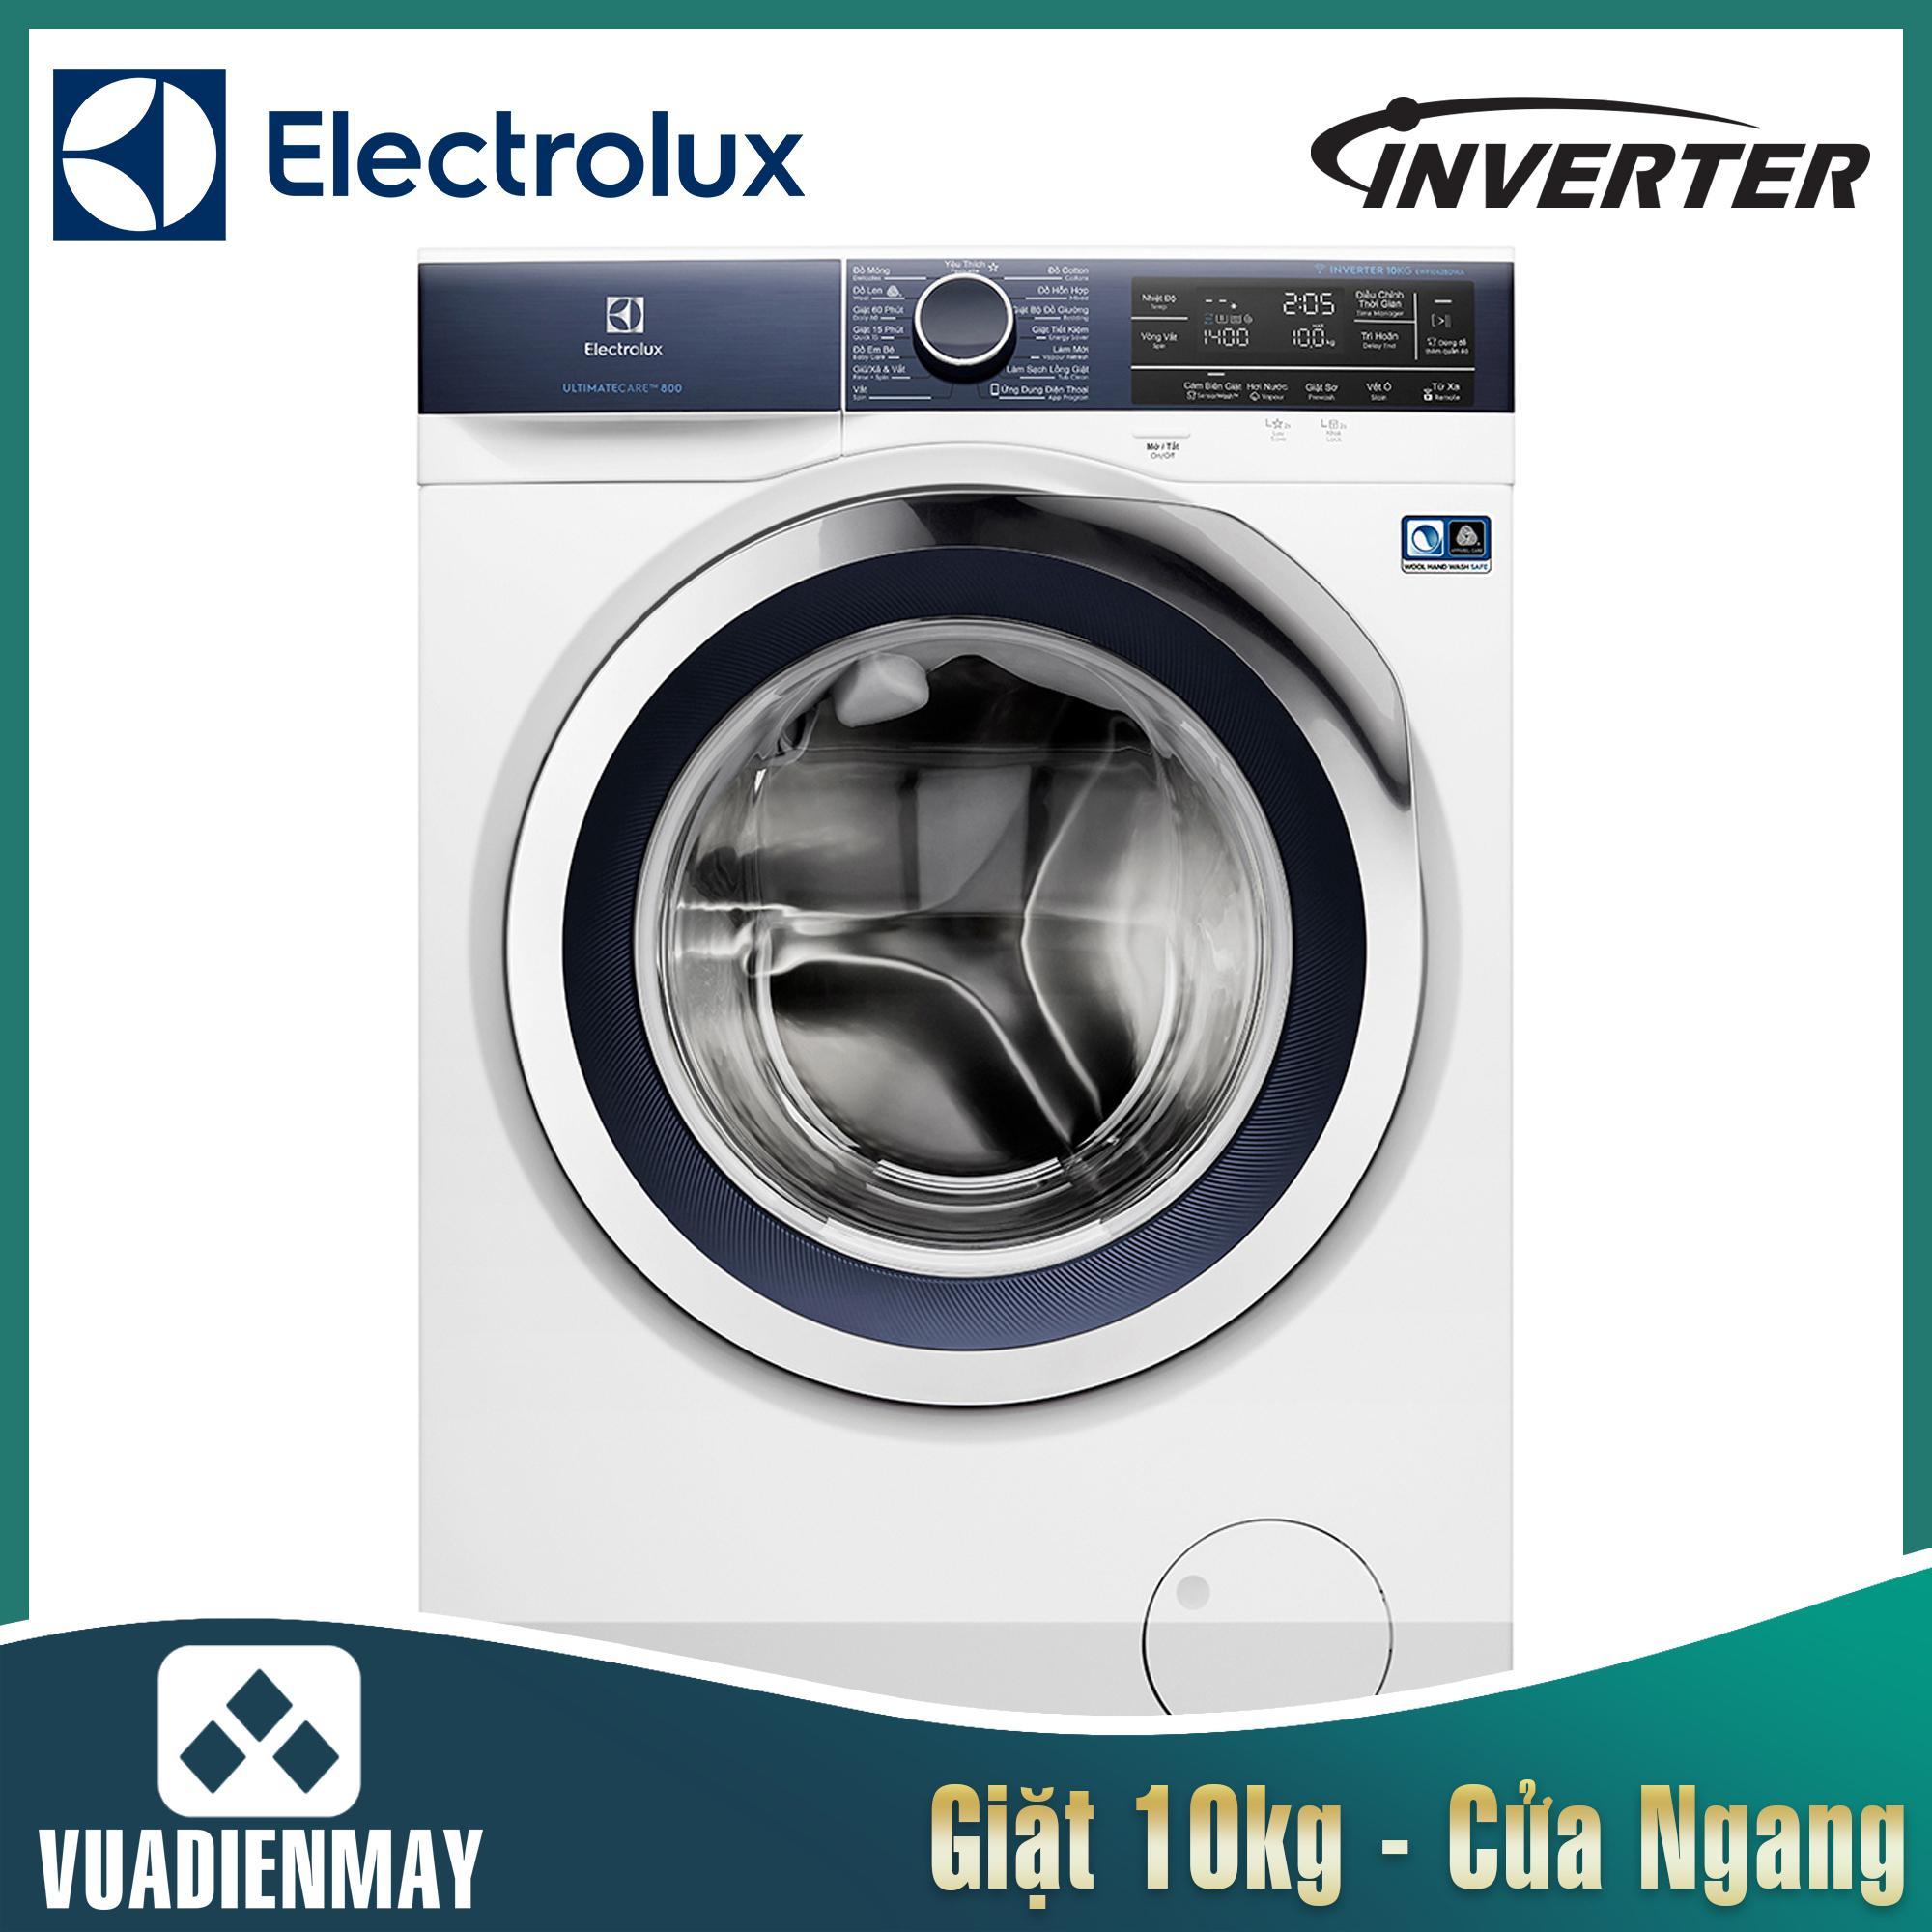 Máy giặt Electrolux 10 kg lồng ngang 1042